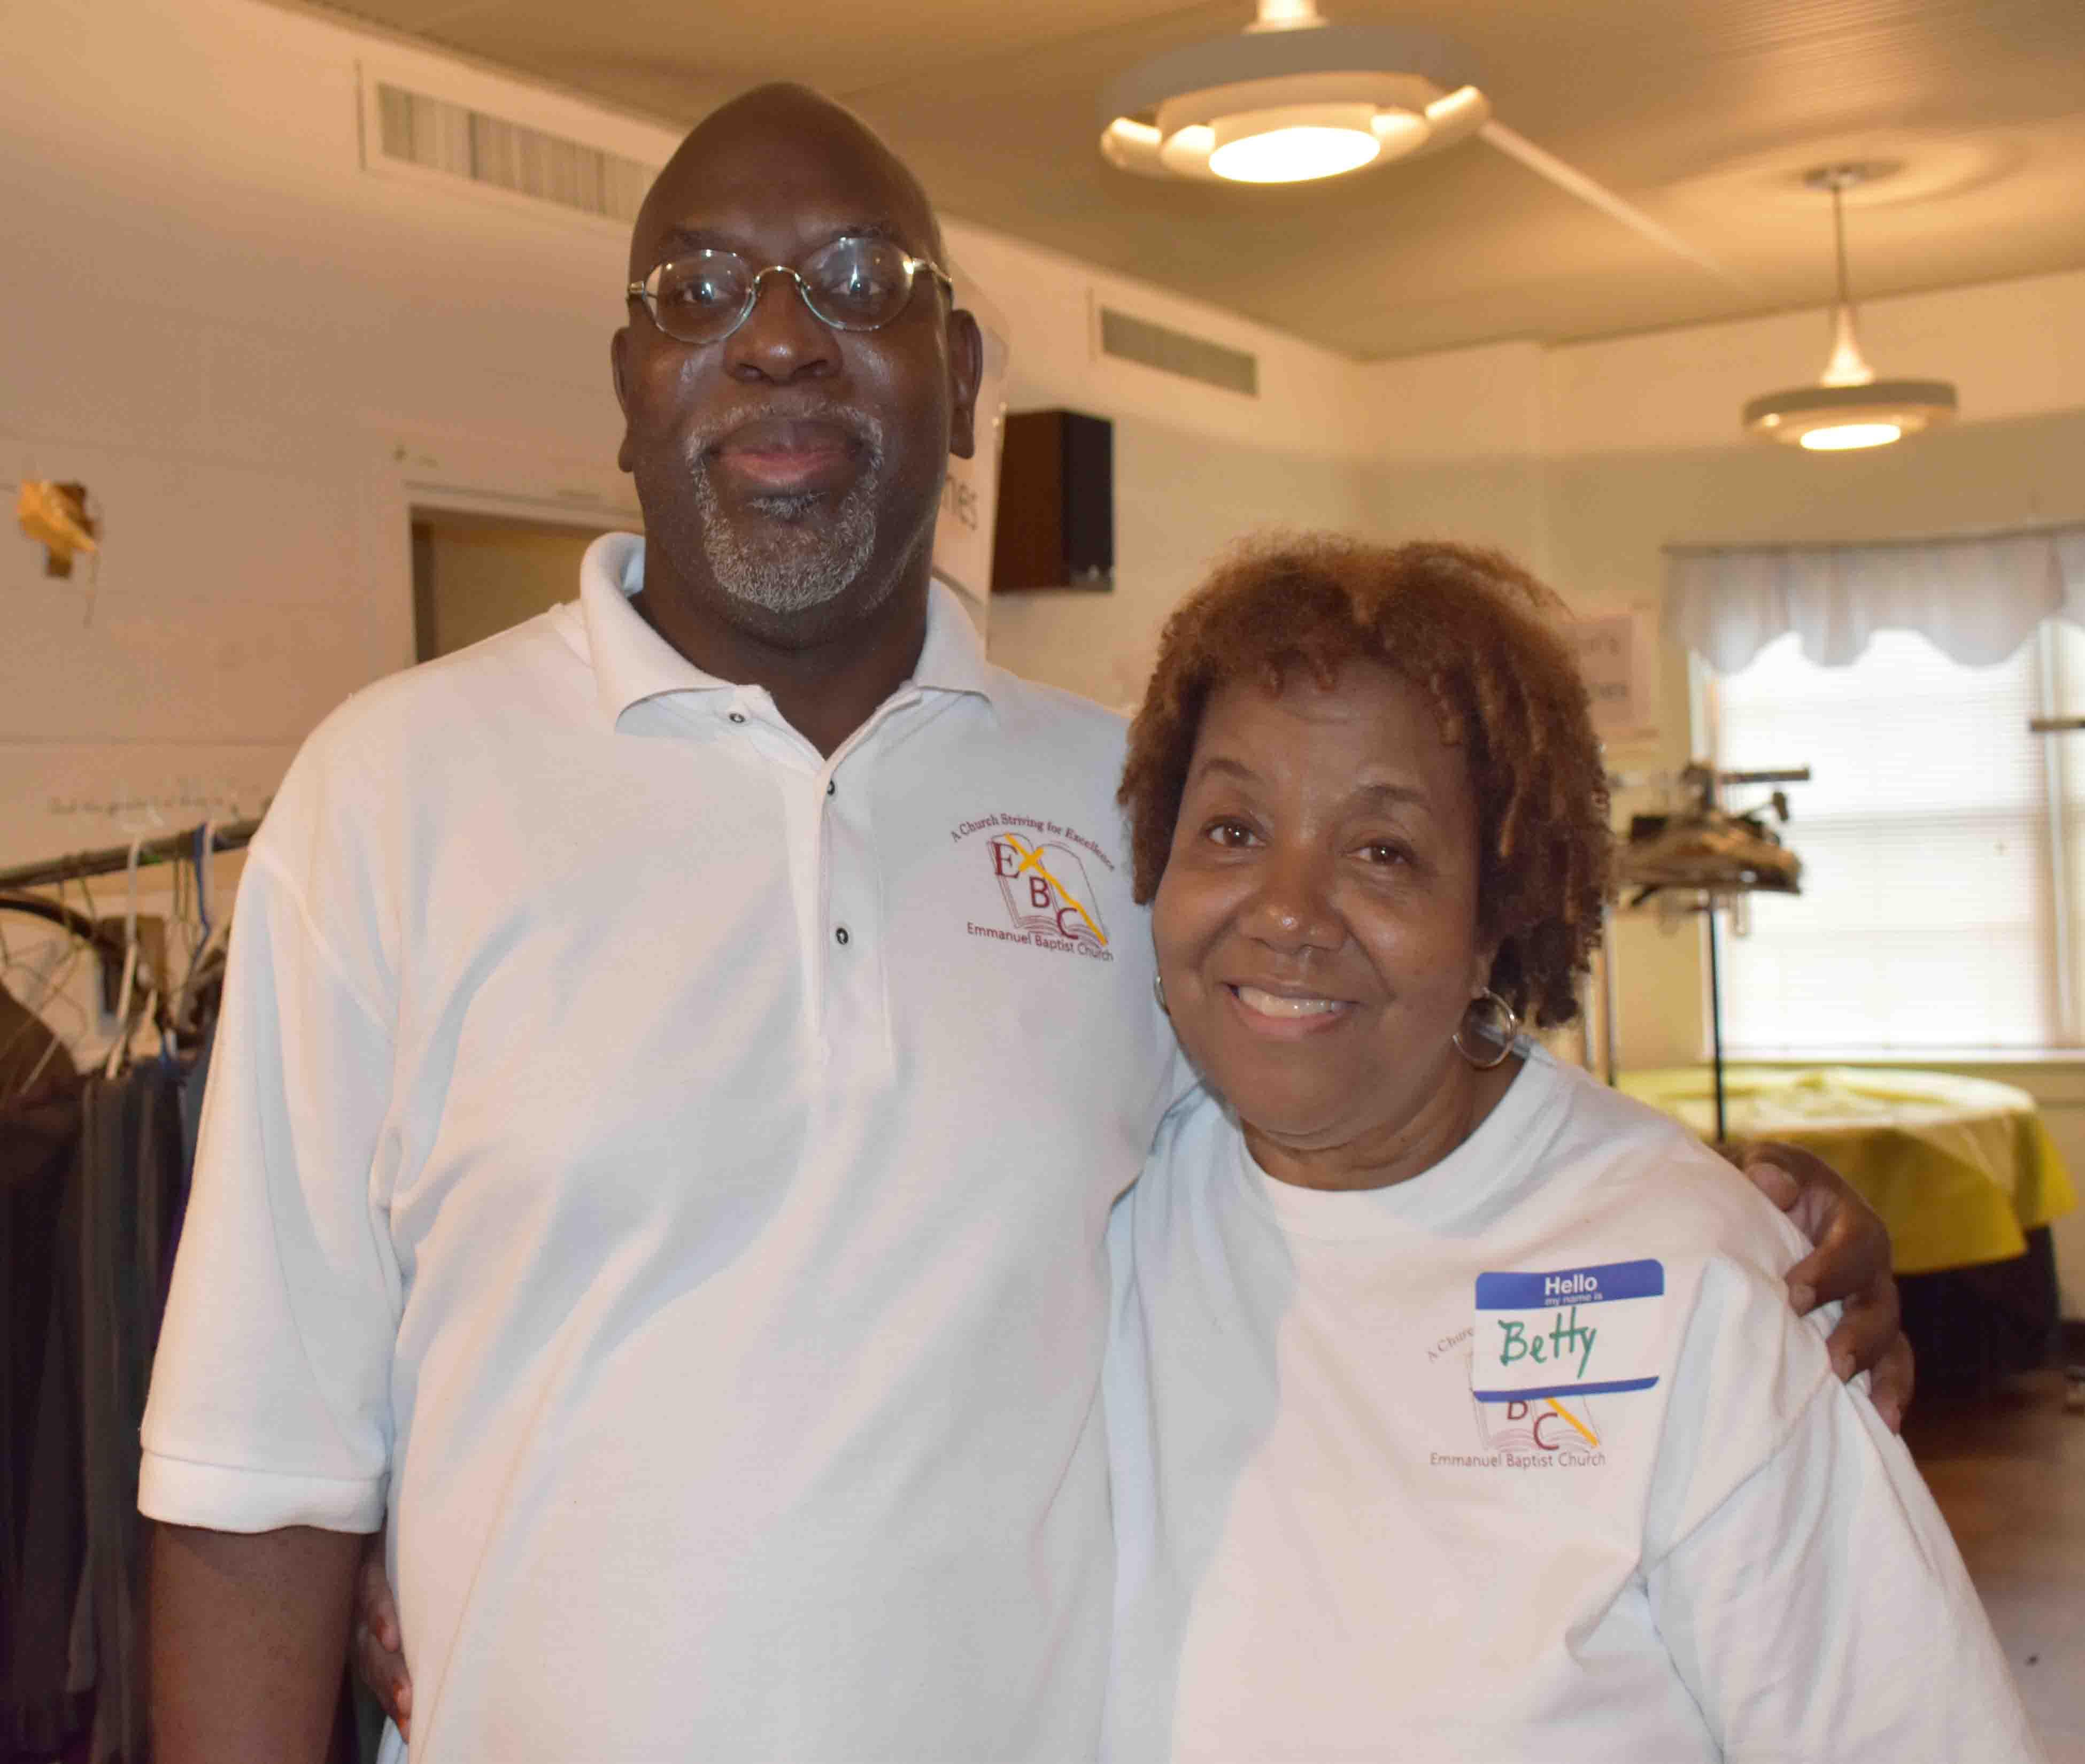 Dr. Tim Edwards, Betty Hicks